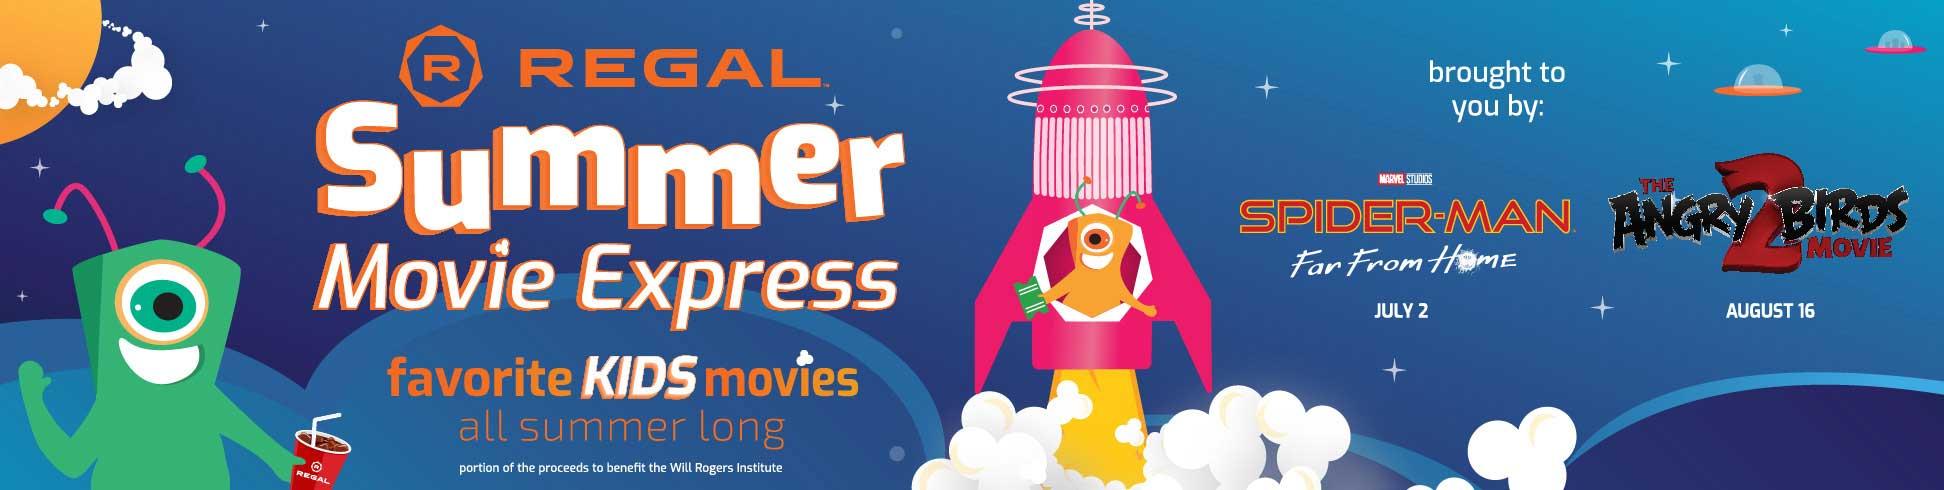 Regal 2019 Summer Movie Express